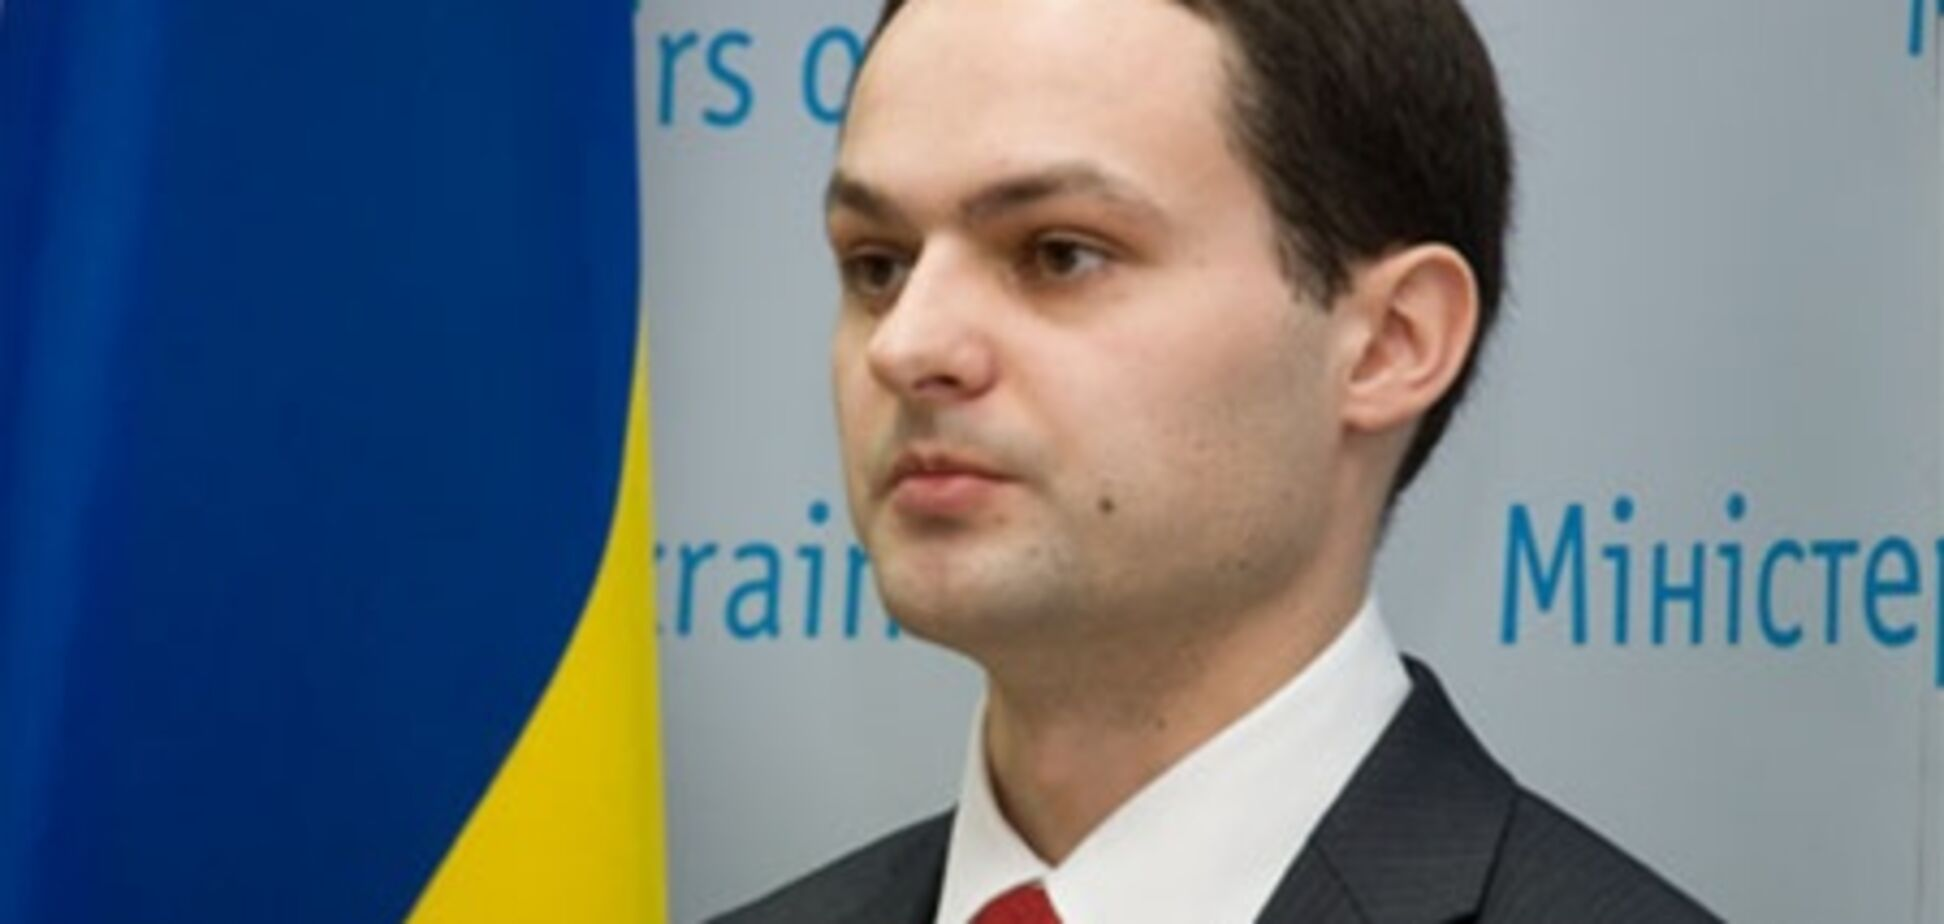 МИД: пираты захватили судно с украинцем на борту